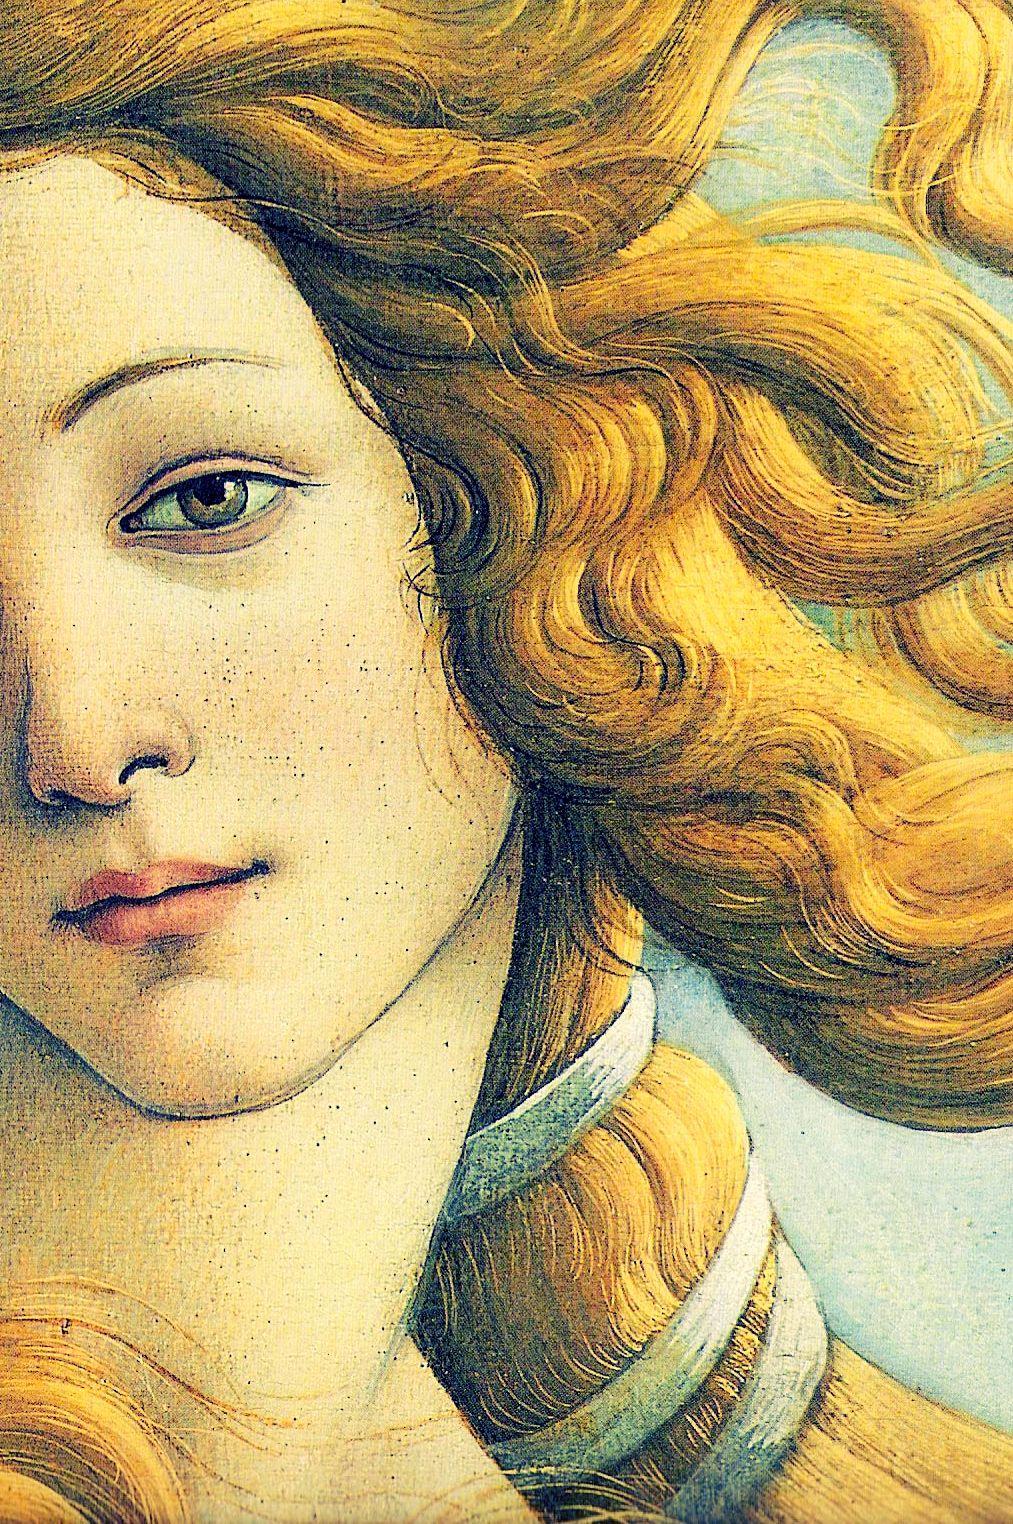 Birth Of Venus Detail 1483 85 Sandro Botticelli Alessandro